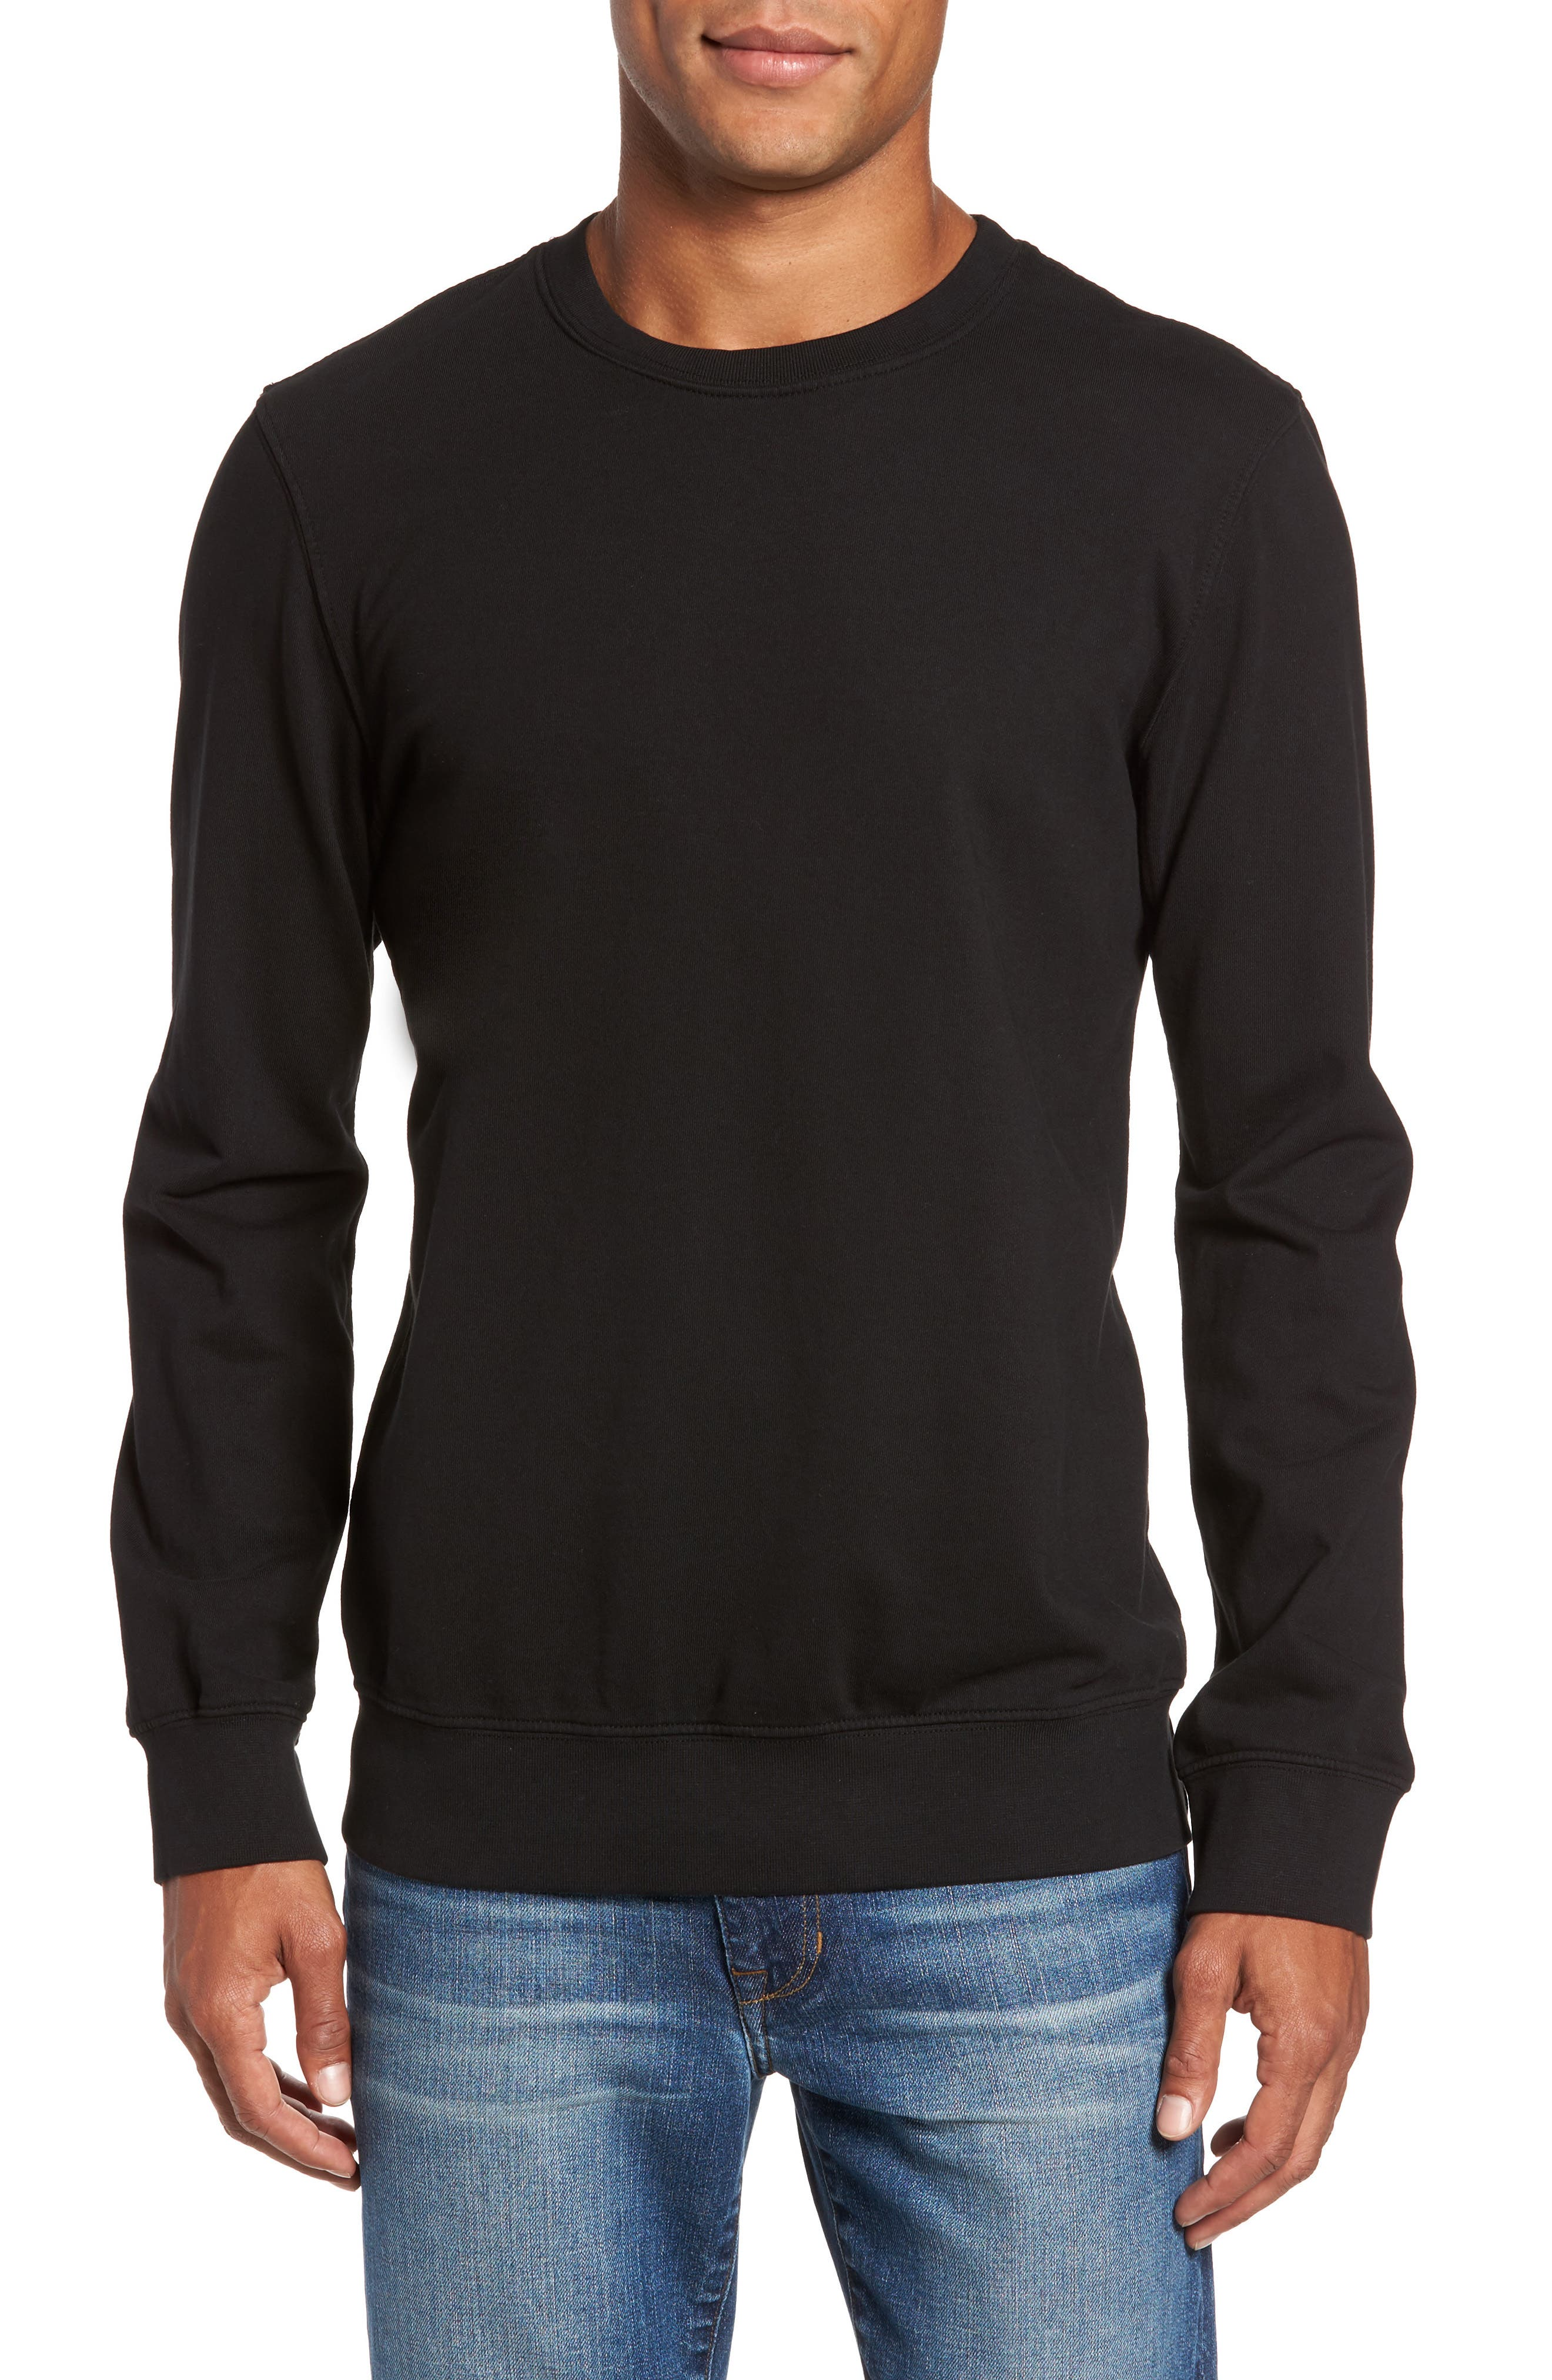 French Terry Sweatshirt,                             Main thumbnail 1, color,                             001